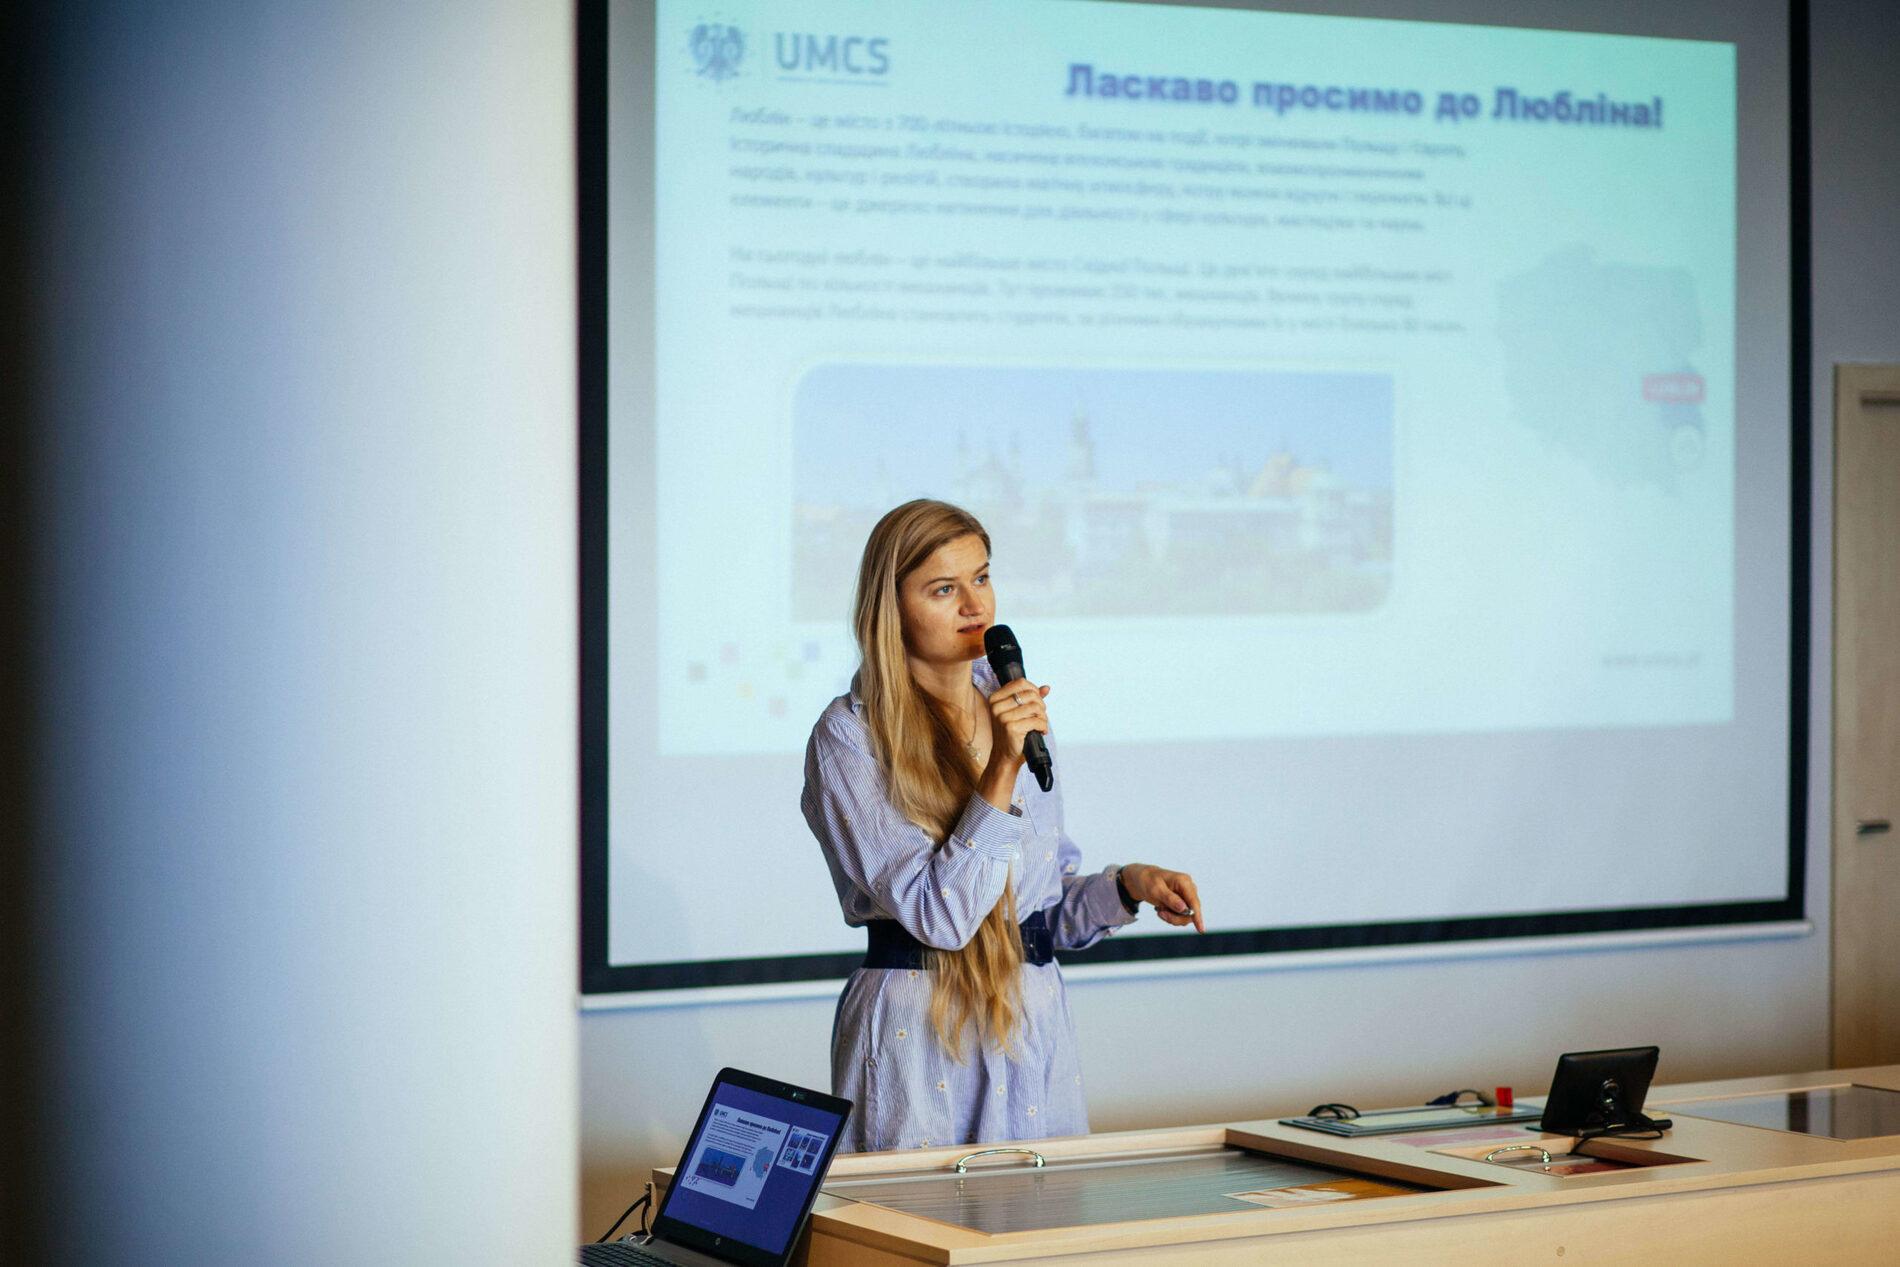 Презентация обучения в Университете им. Марии Кюри-Склодовской - UniverPL